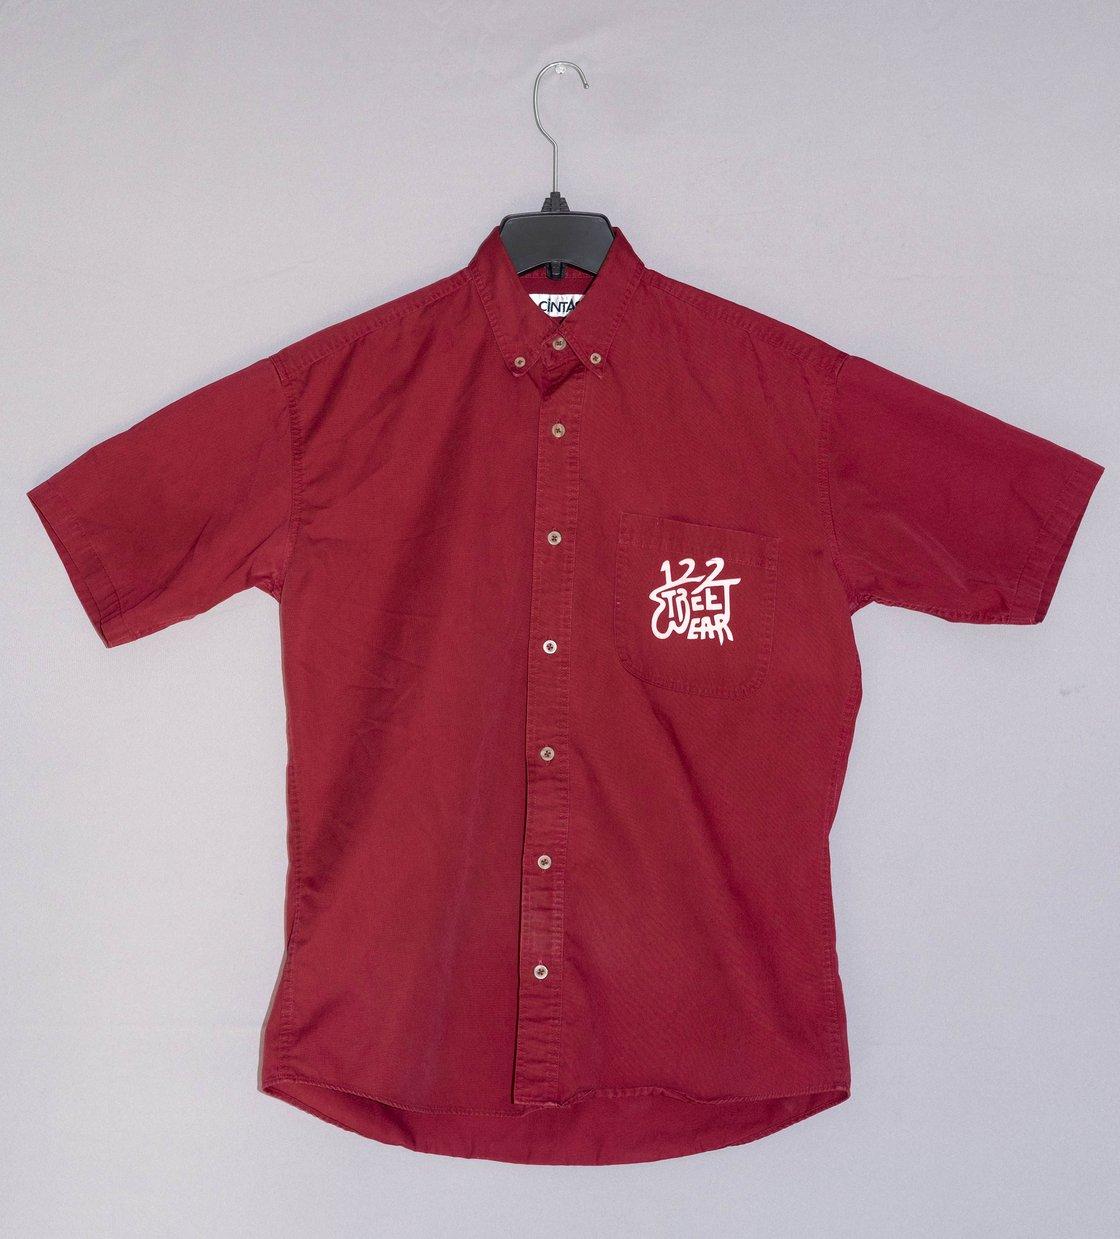 Image of 8 Ball Shirts